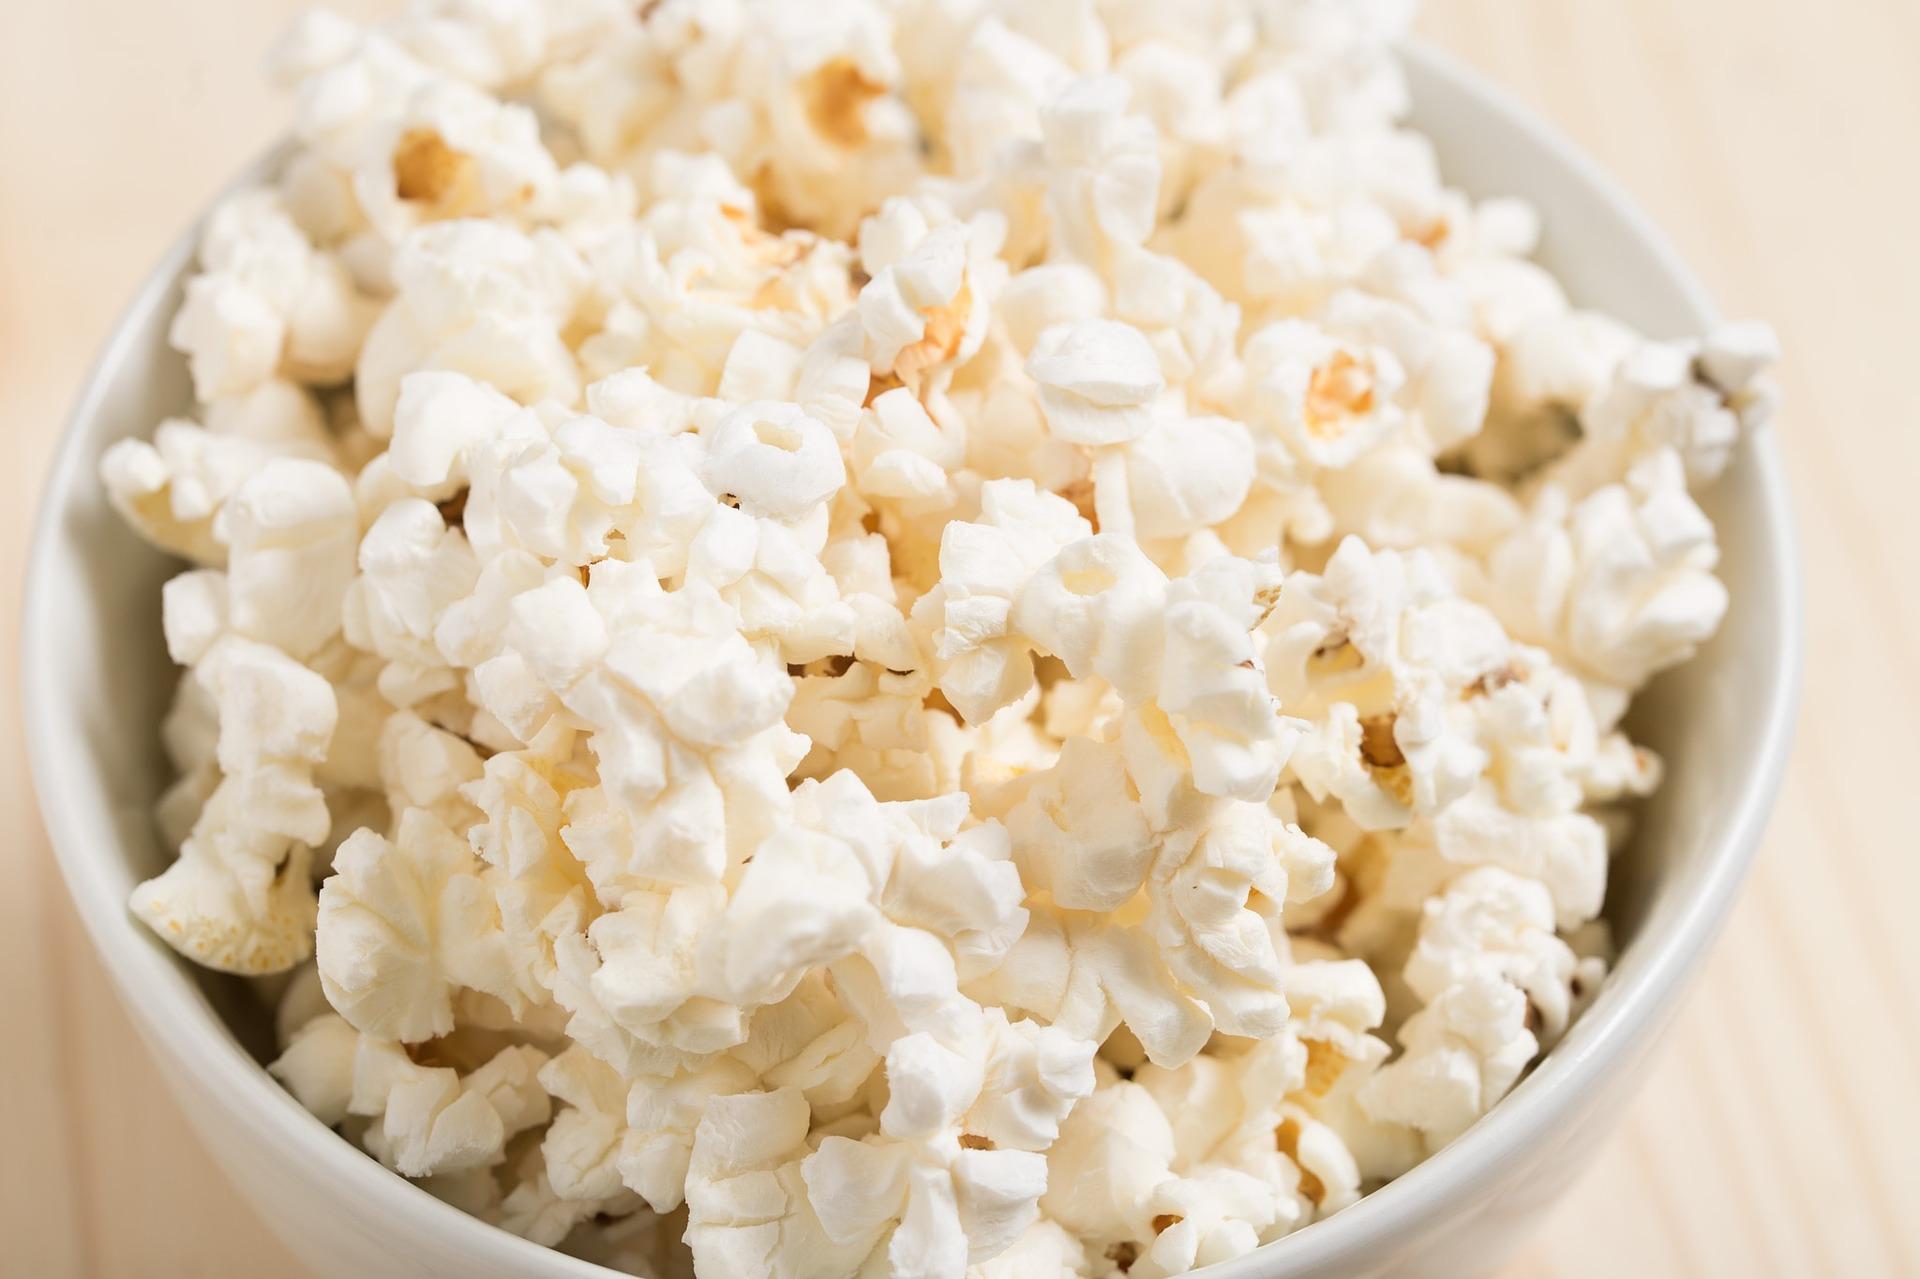 snack-1284230_1920.jpg